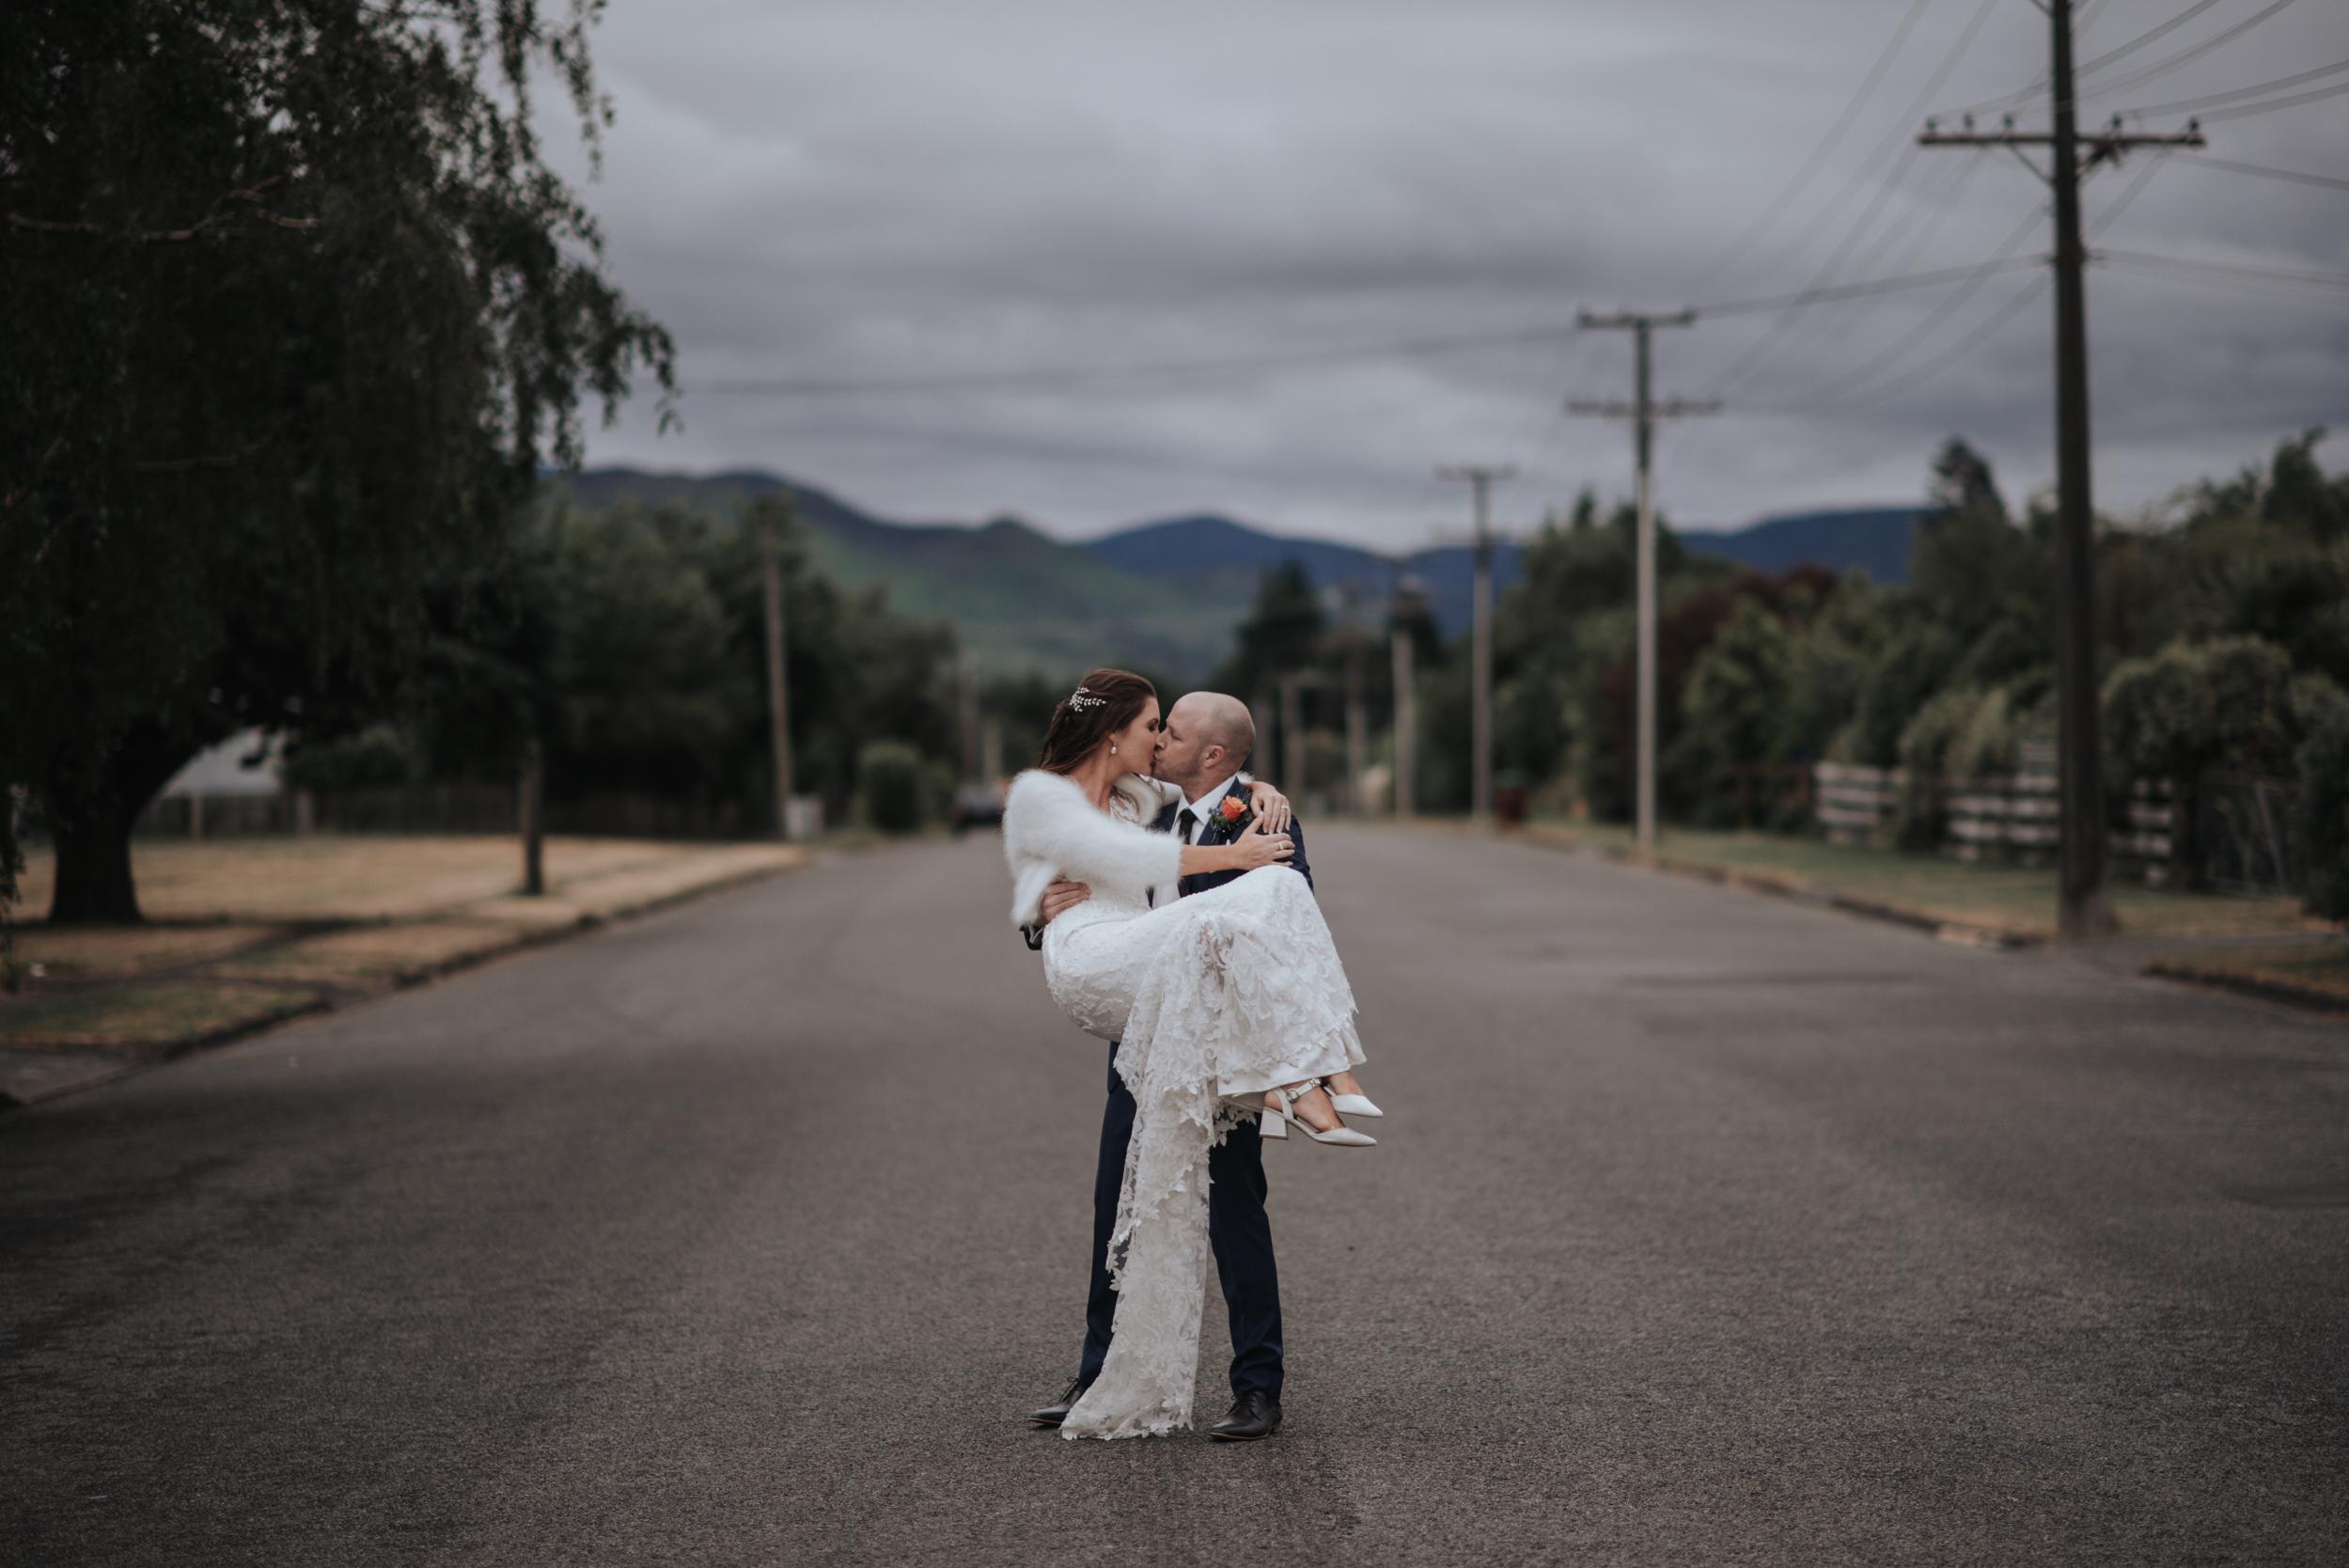 LOVELENSCAPES WEDDING PHOTOGRAPHY • TARUREKA ESTATE WEDDING • ANNA CAMPBELL WINDSOR WEDDING GOWN •FEATHERSTON WEDDING PHOTOGRAPHER • NEW ZEALAND WEDDING PHOTOGRAPHER • MOBILE SIZE • 216.jpg